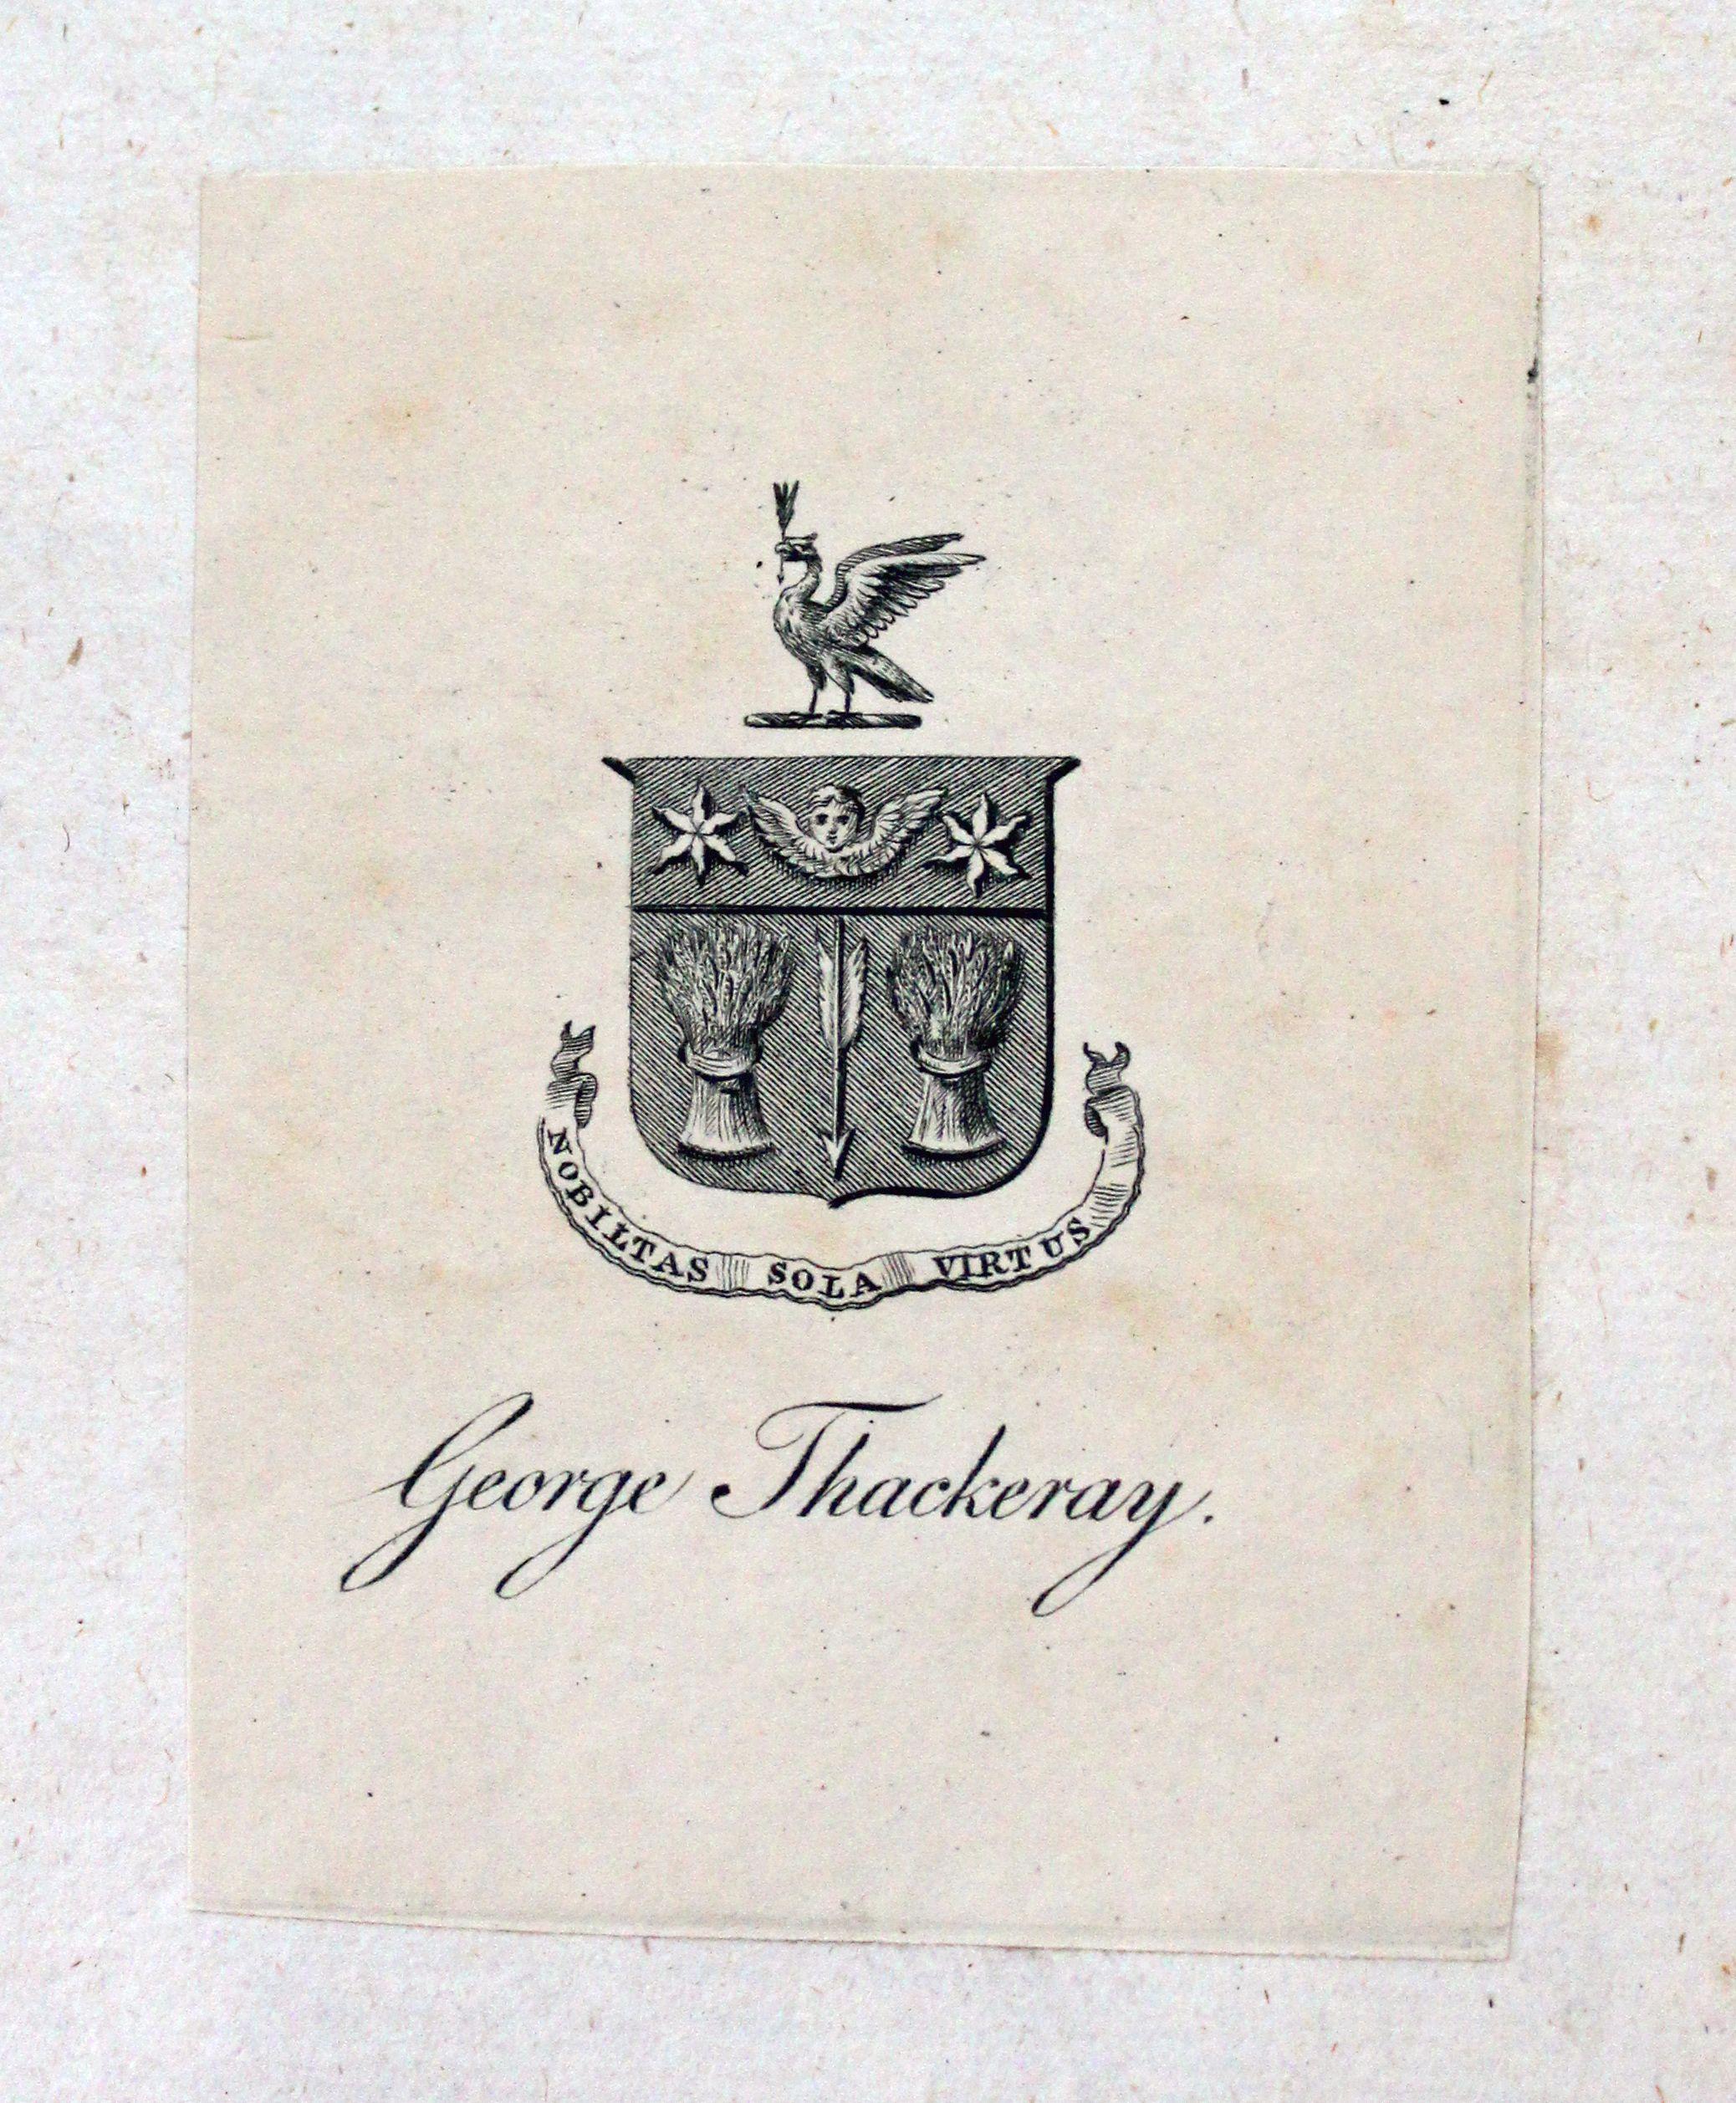 Thackeray's book plate